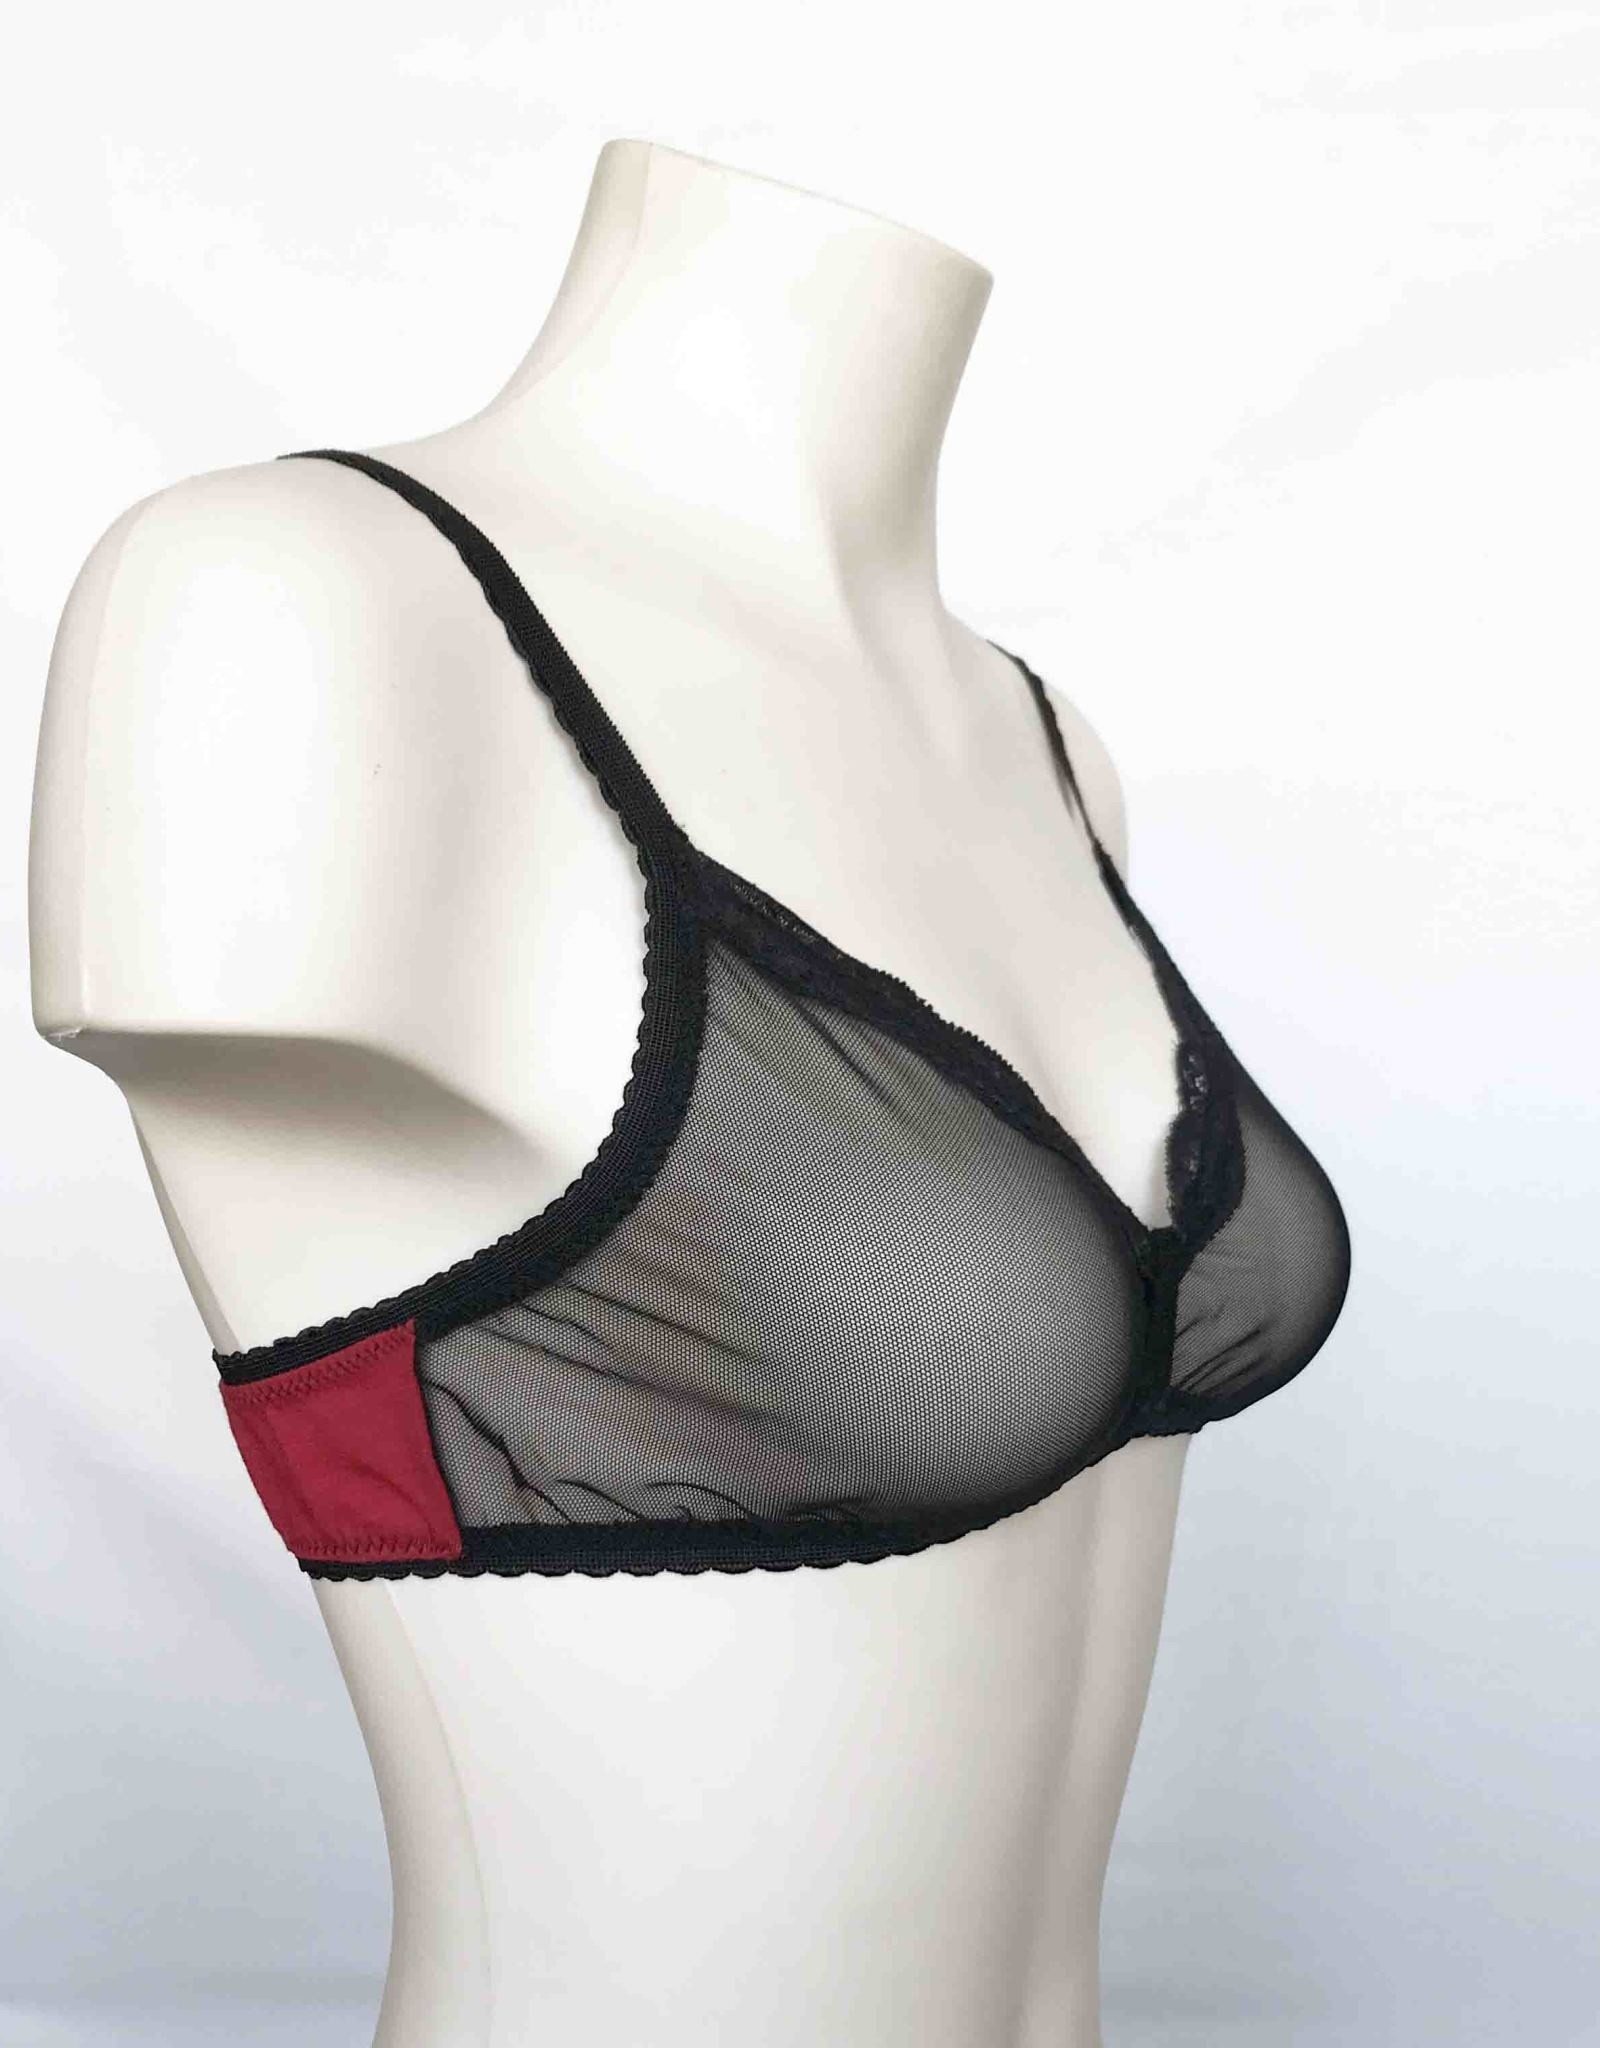 Devil May Wear Lola Bra. 100% Nylon Mesh Front, Bamboo Blend Back. Flame/Black